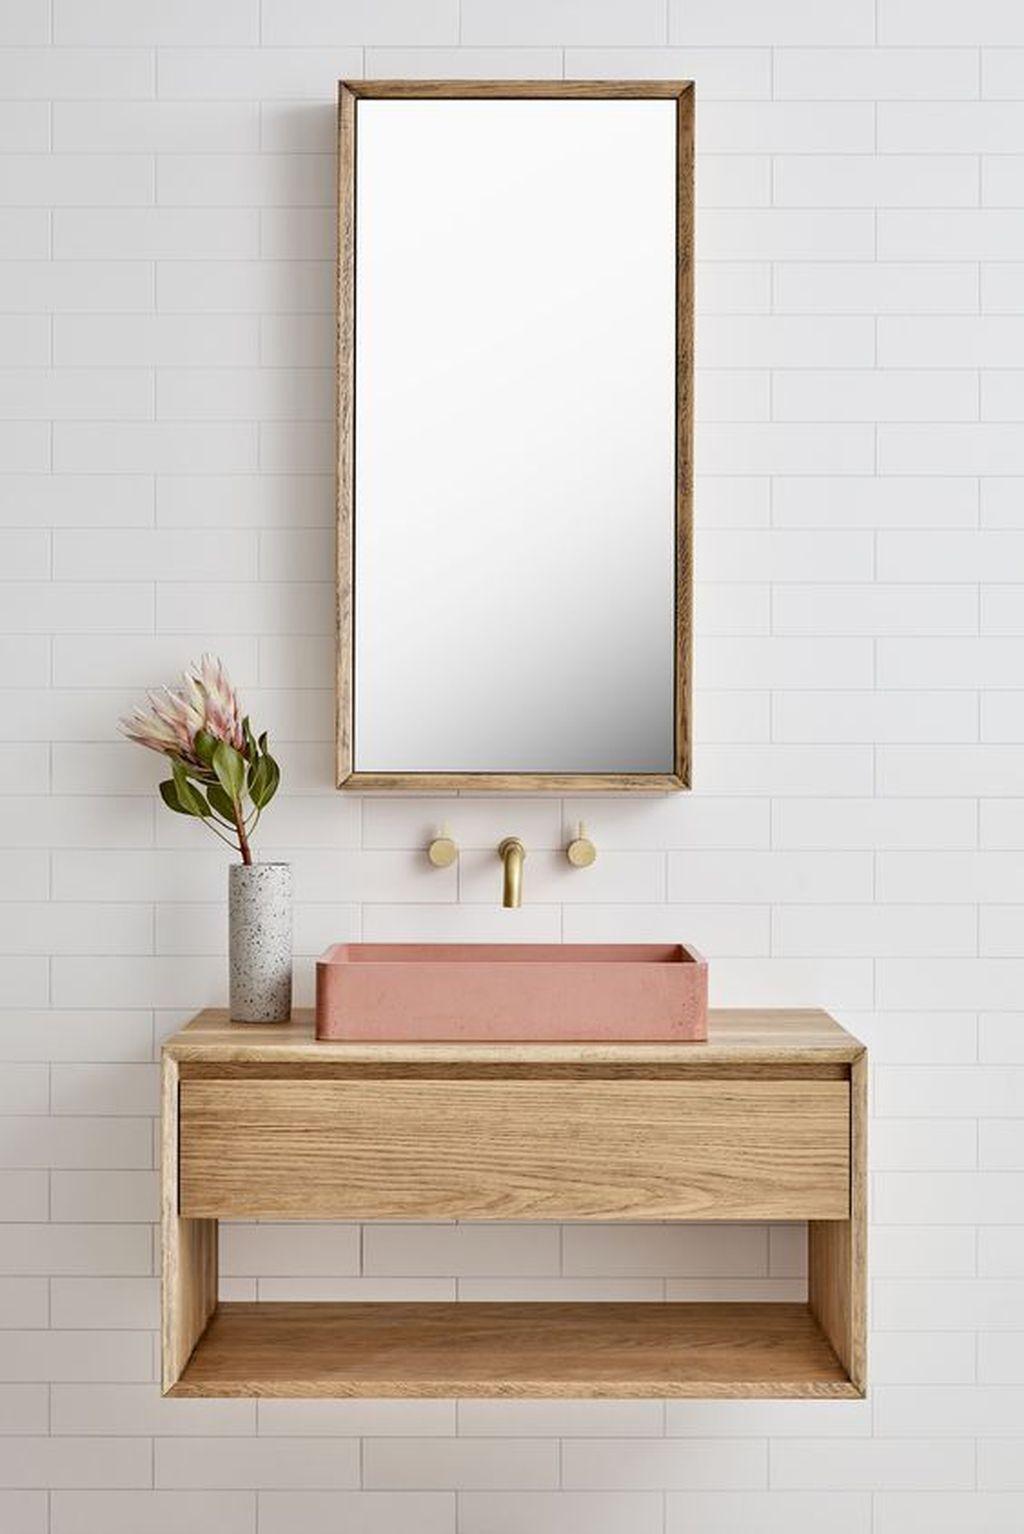 extraordinary bathroom design tile showers ideas | 35 Extraordinary Bathroom Interior Design Ideas | Bathroom ...